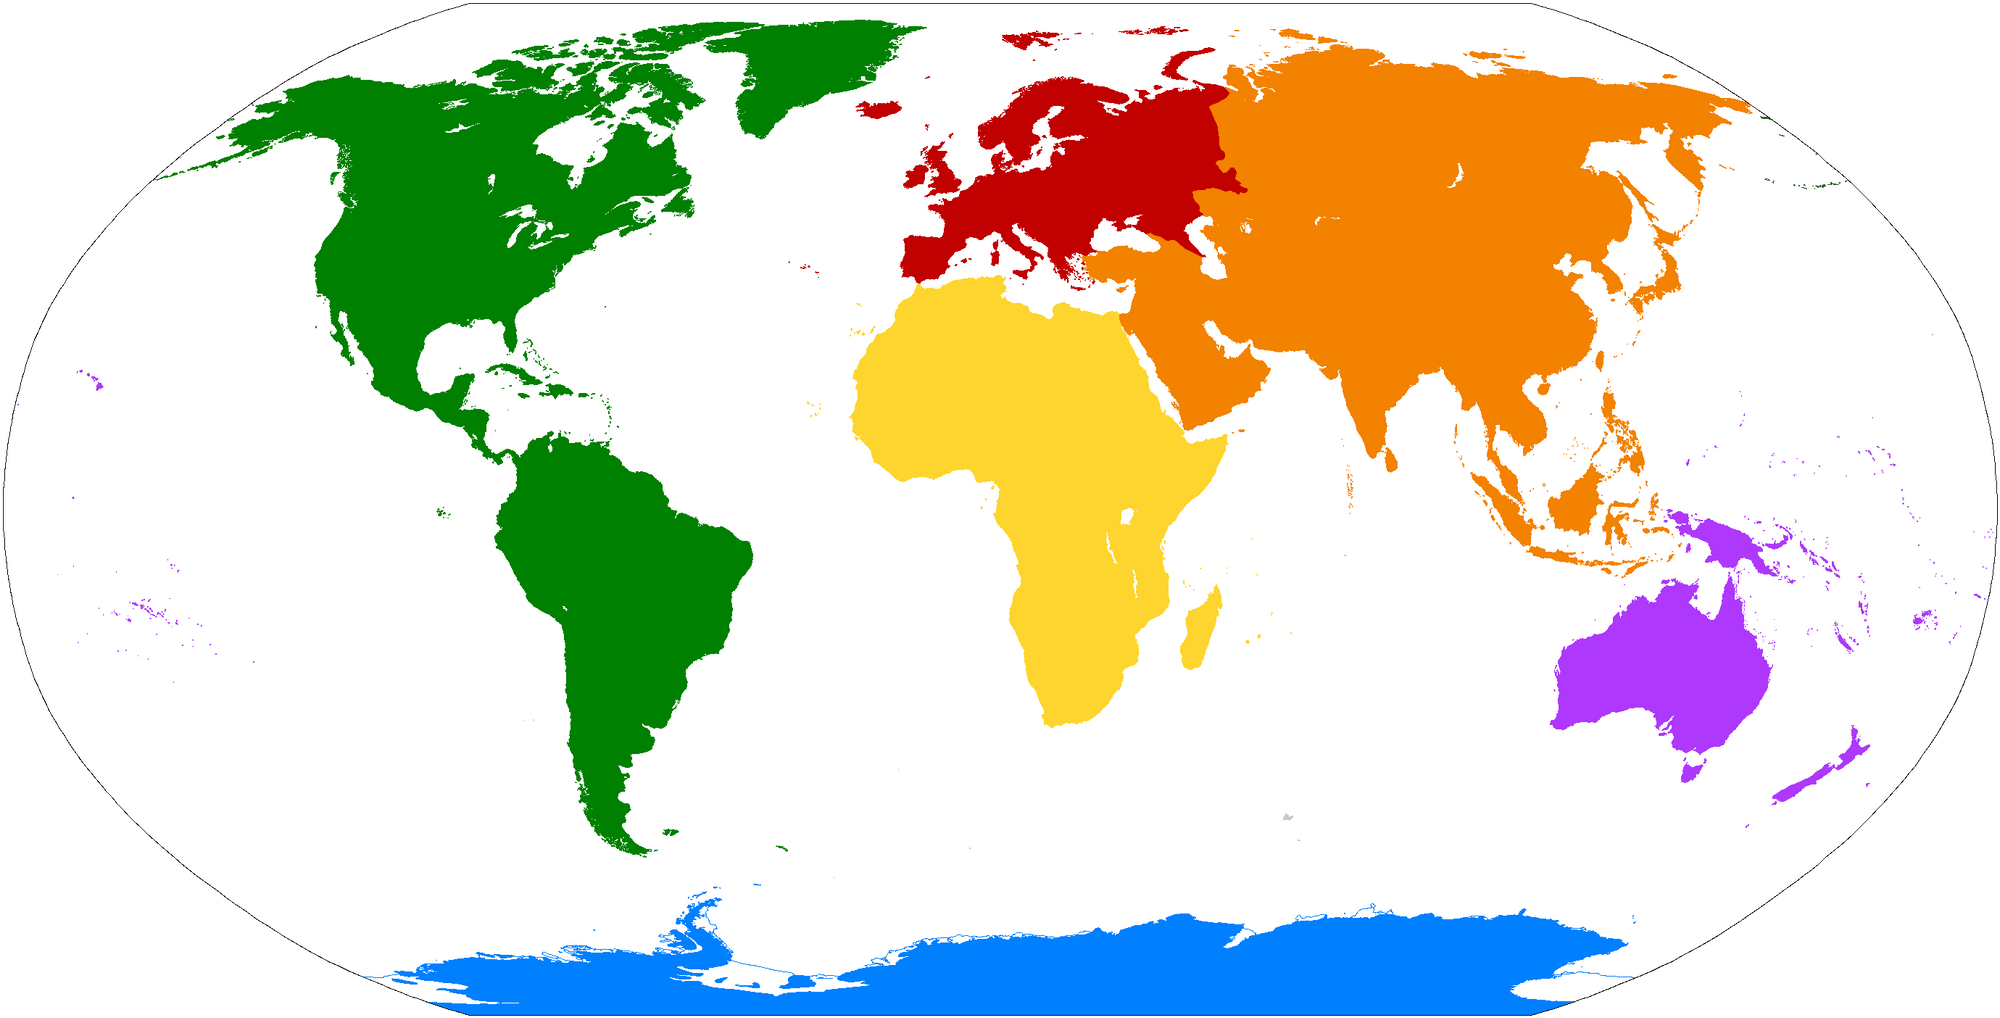 https://upload.wikimedia.org/wikipedia/commons/4/4f/Maailmajaod_pd.png